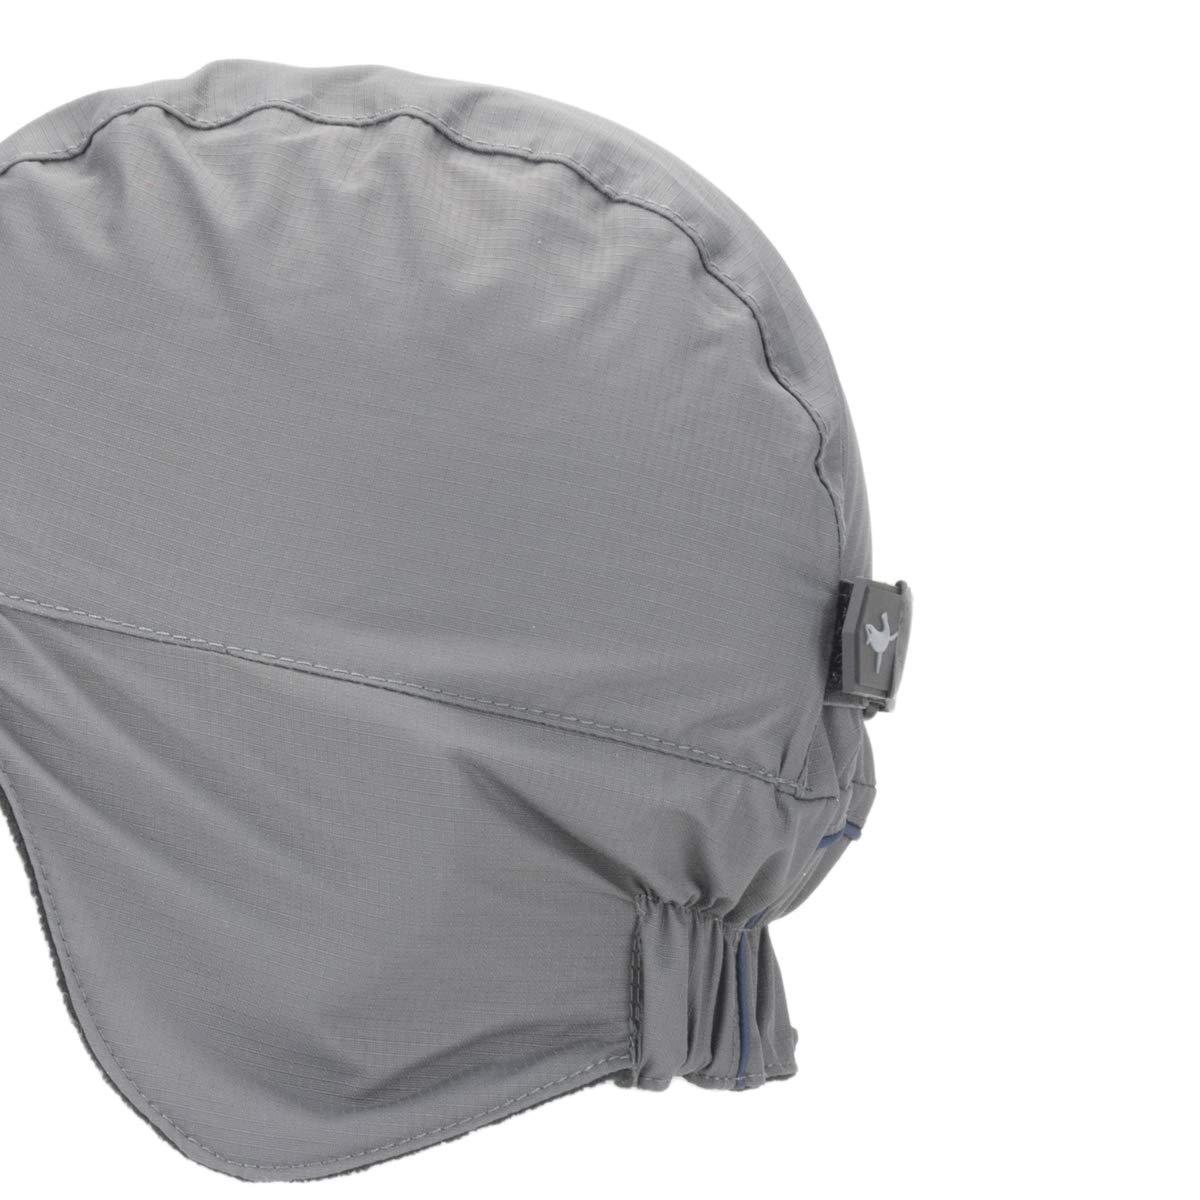 SEALSKINZ Unisex Waterproof Extreme Cold Weather Hat